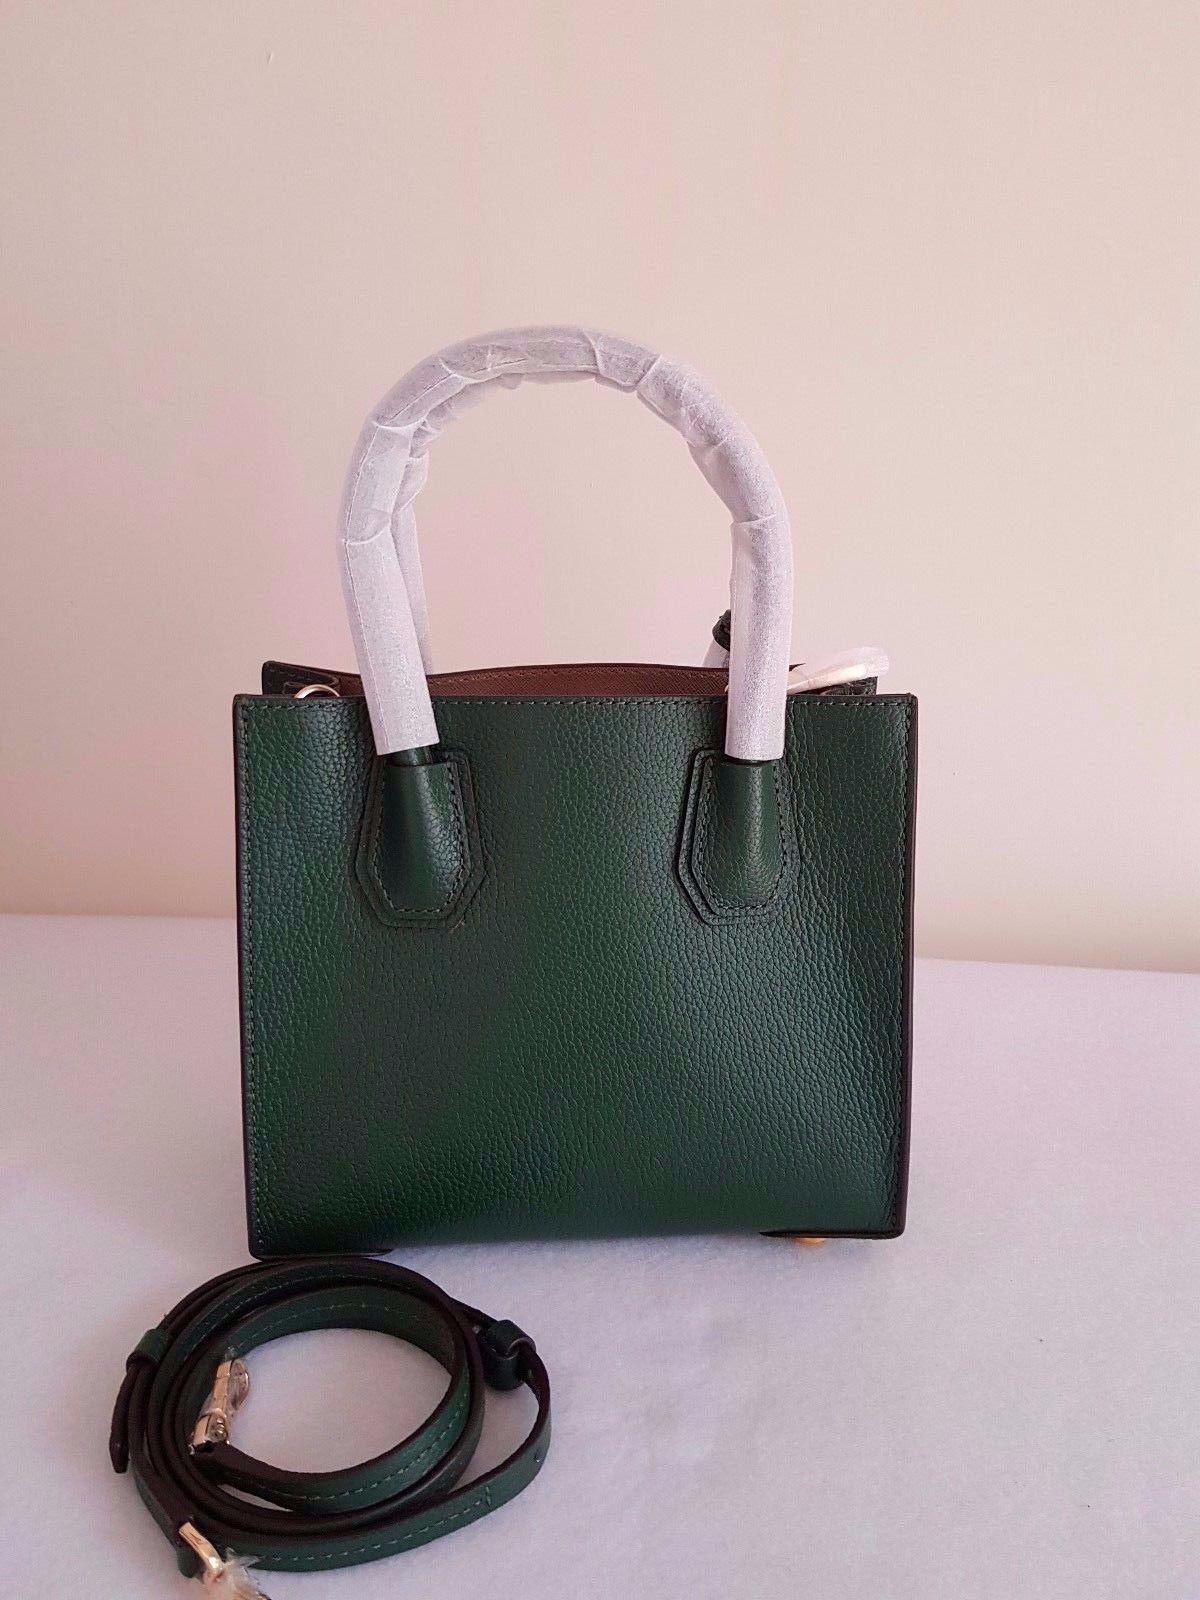 3add9a00fd4c MICHAEL KORS Mercer Leather Crossbody Full-Grain Pebbled Leather Moss Green